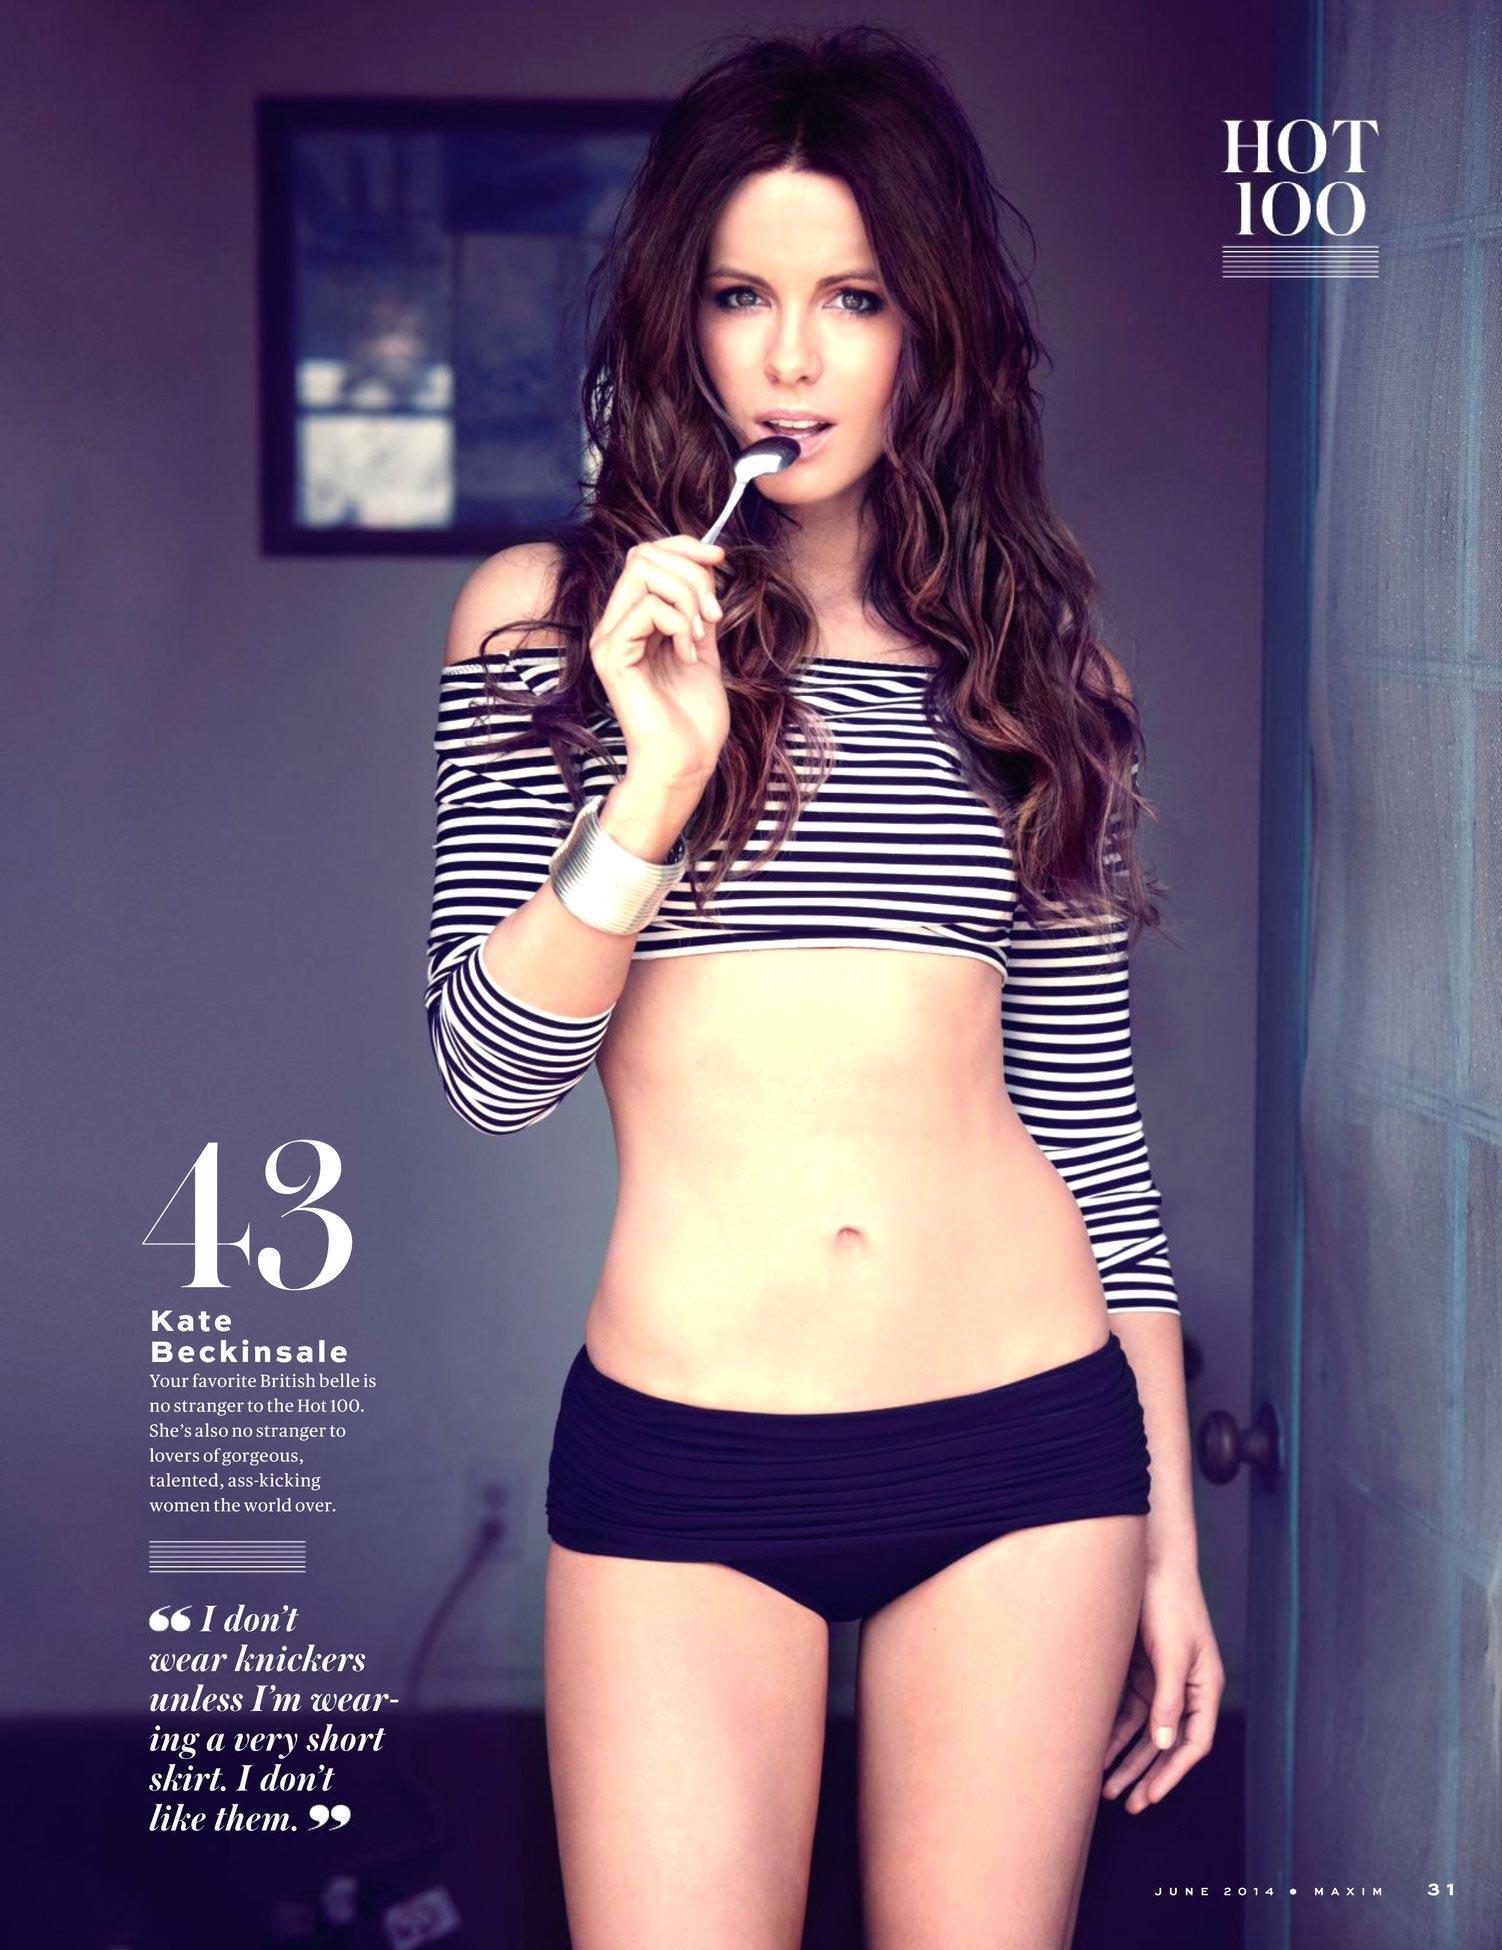 Kate Beckinsale Hot 100 Maxim Magazine June 2014